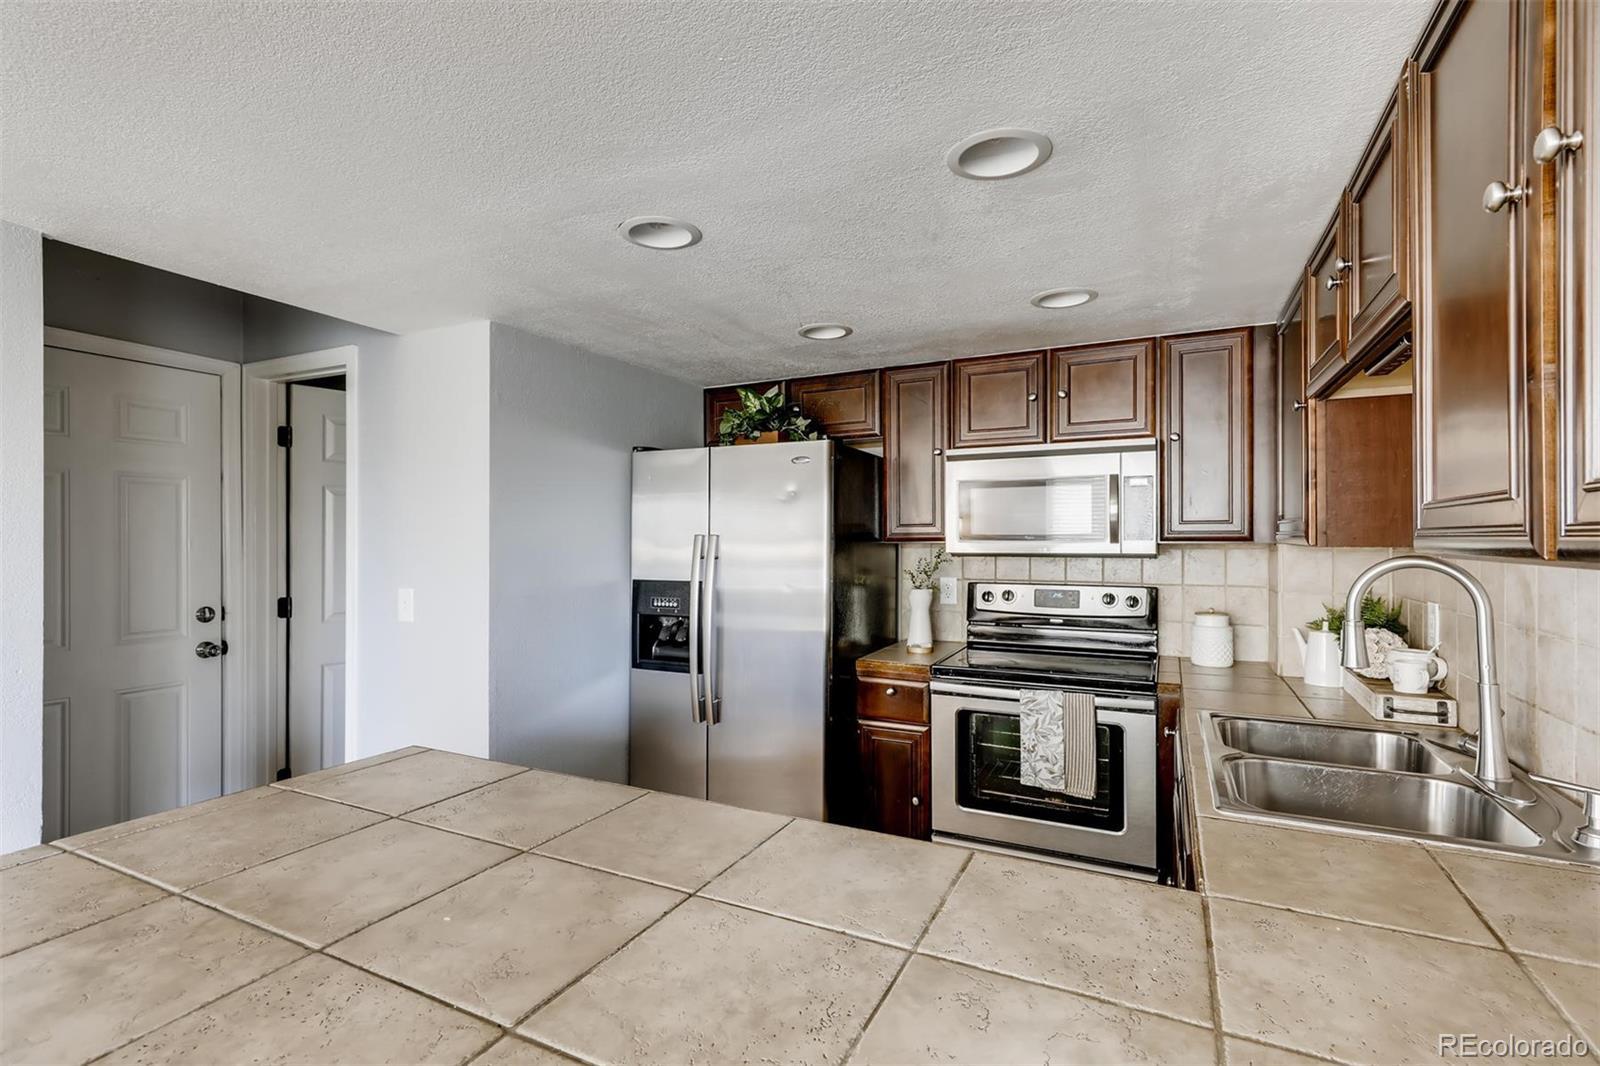 MLS# 7445656 - 11 - 1710 W 101st Avenue, Thornton, CO 80260